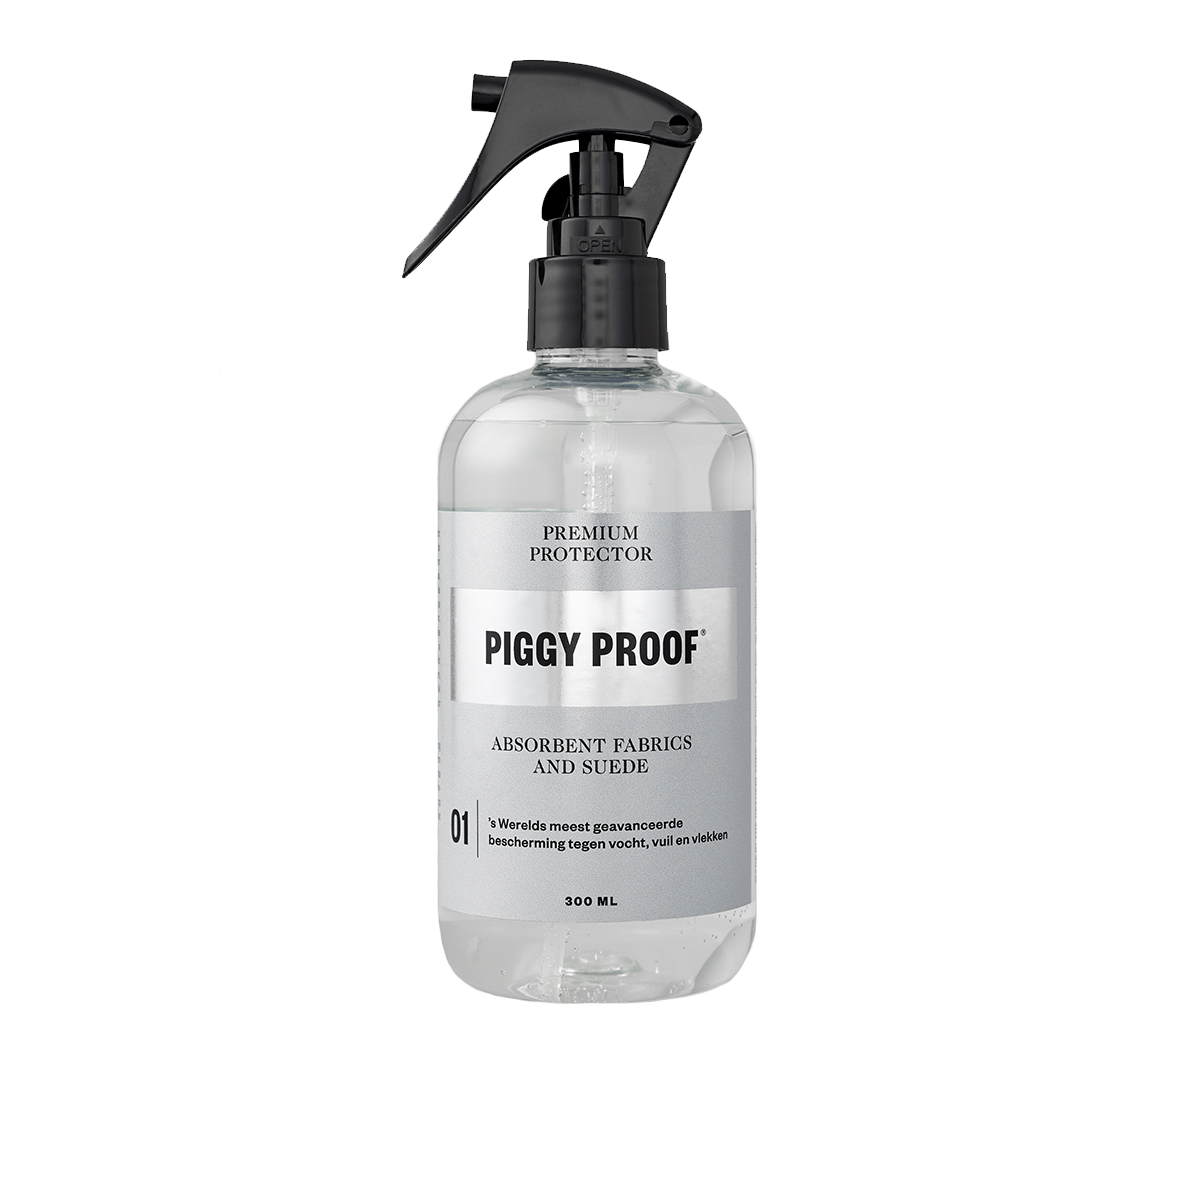 Piggy Proof | 01 Premium Protector Absorbent Fabrics | 150ml €17,50 300ml €24,99